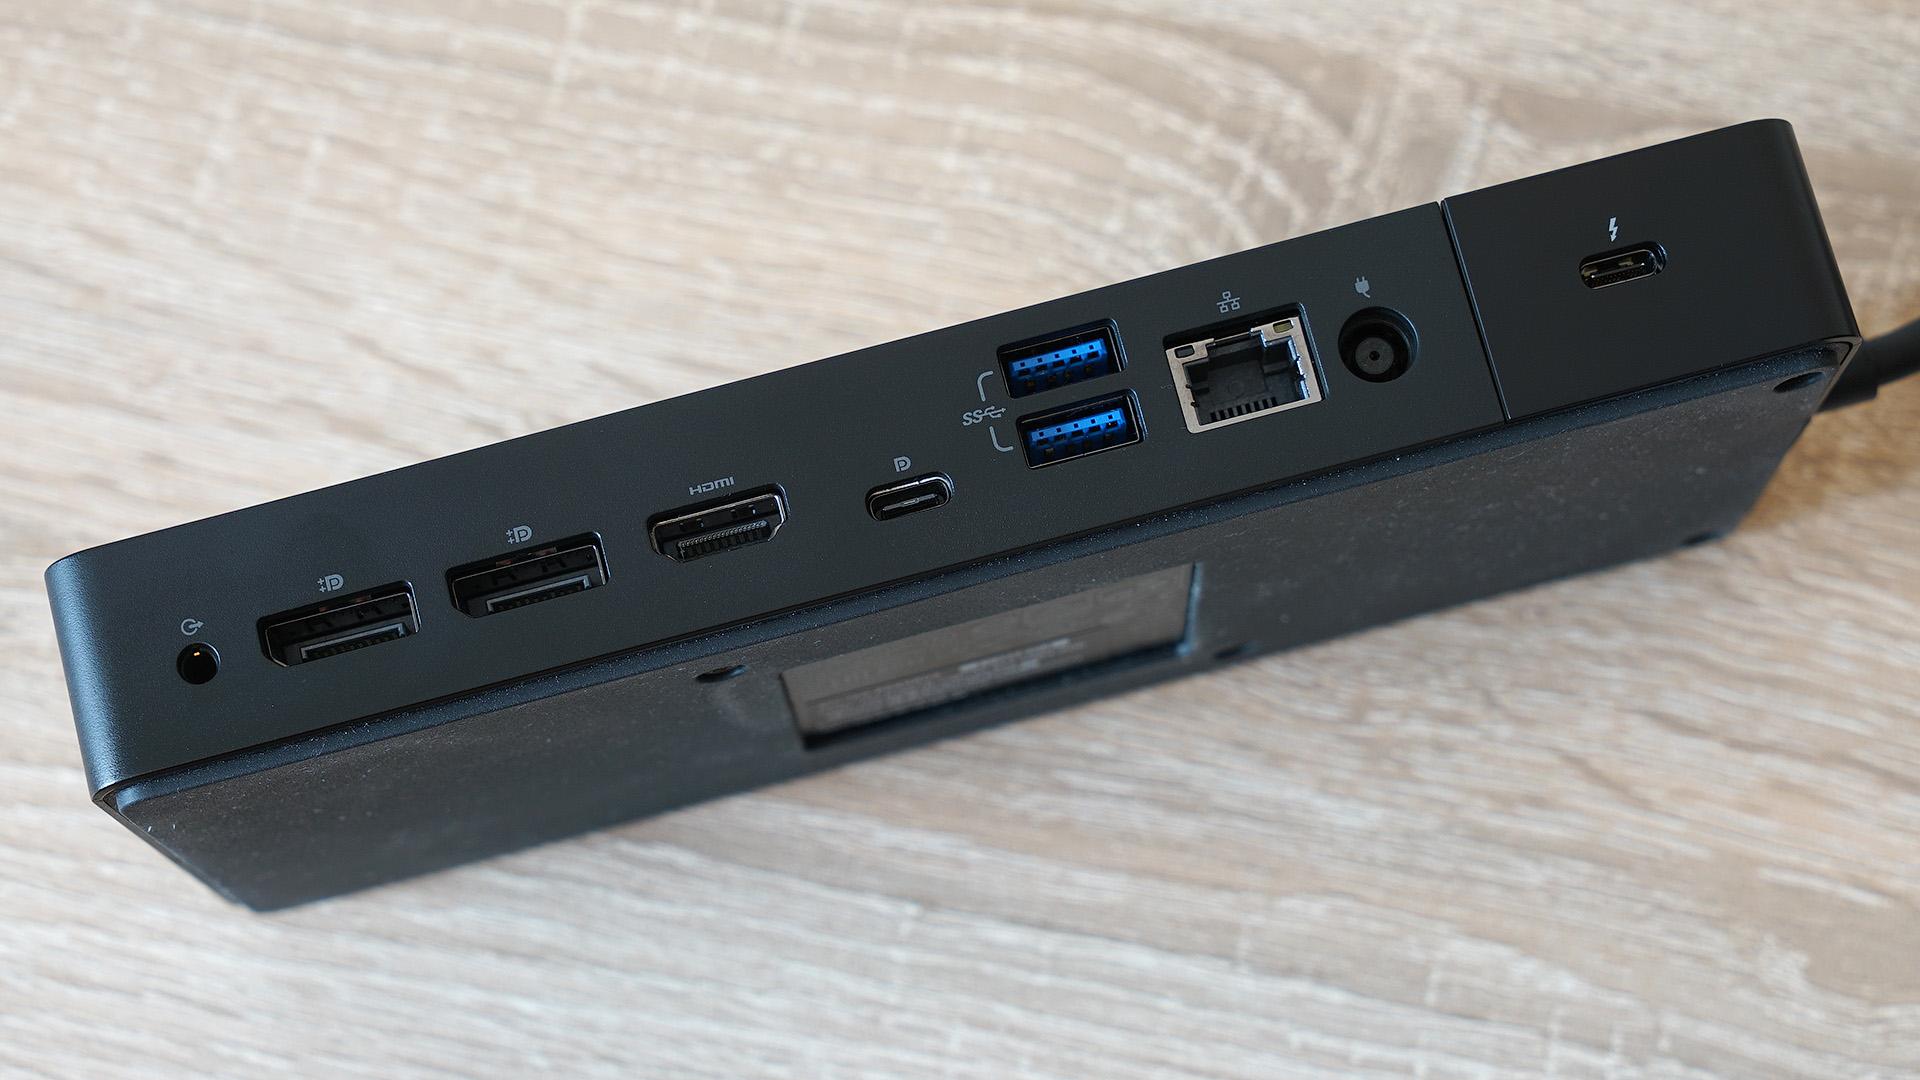 Dell Latitude 7400 2-in-1: красивый и лёгкий корпоративный